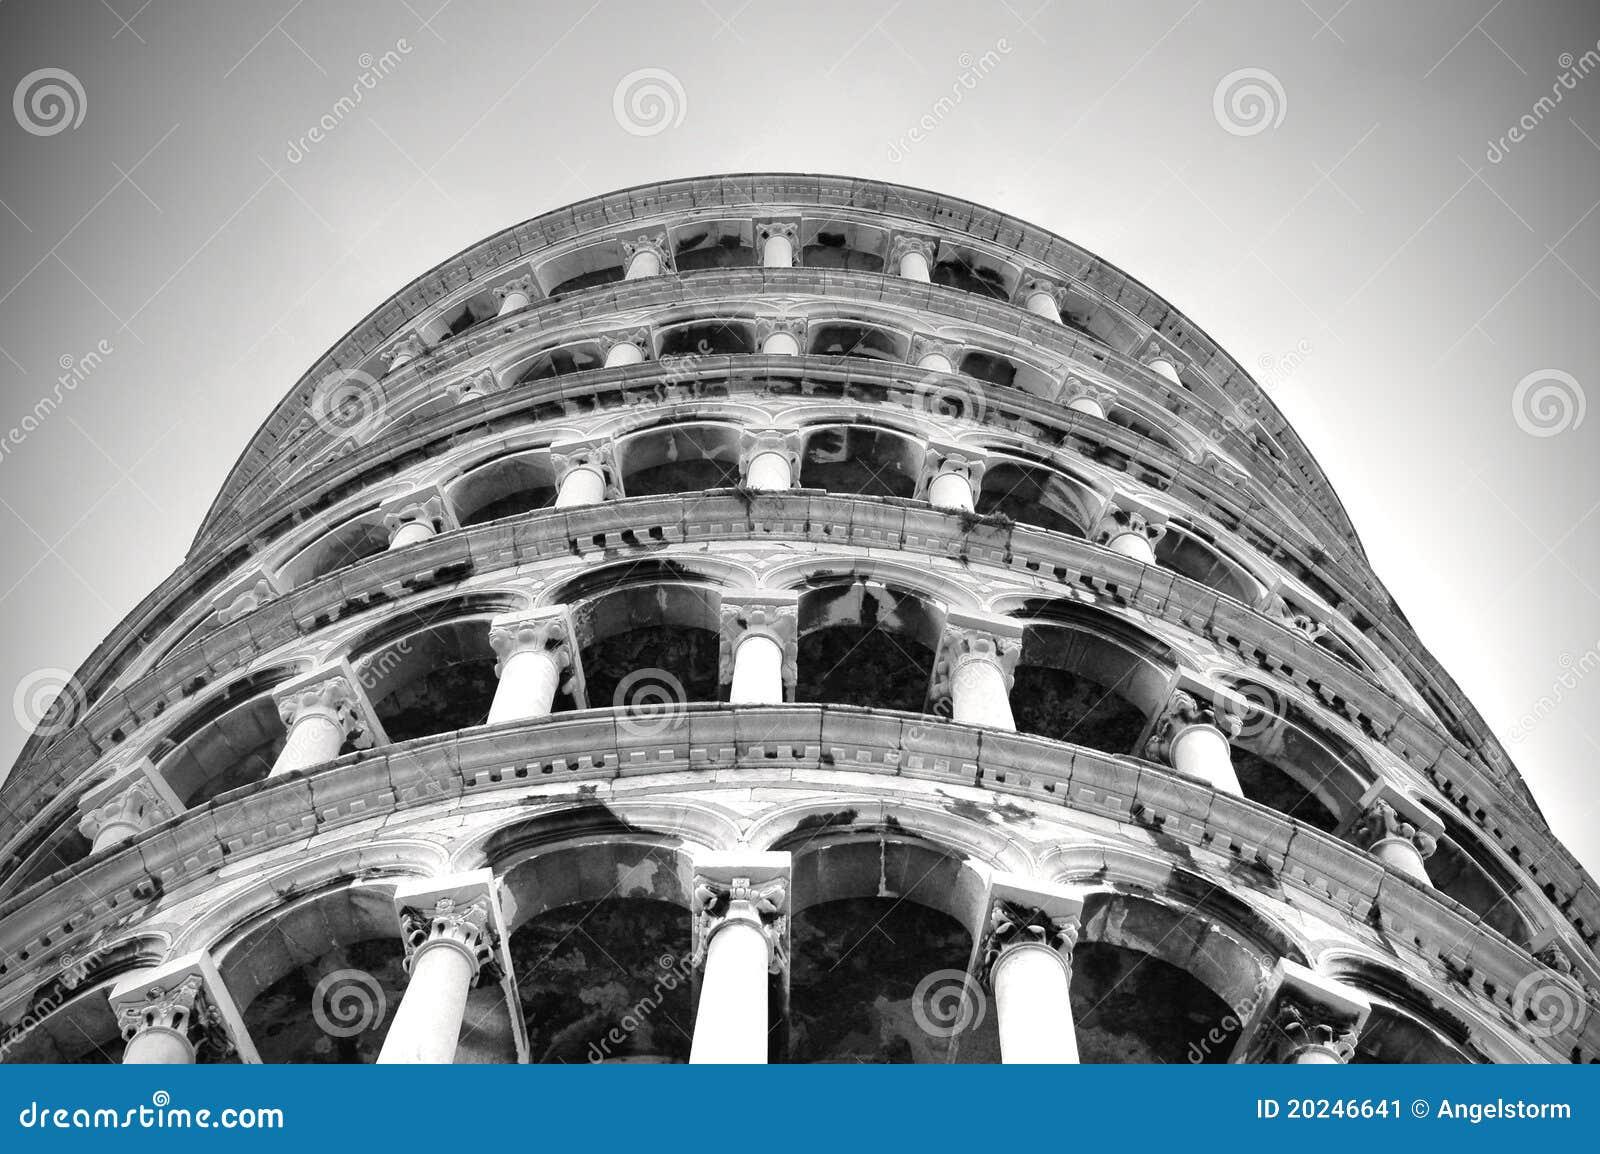 Tower of pisa against diving